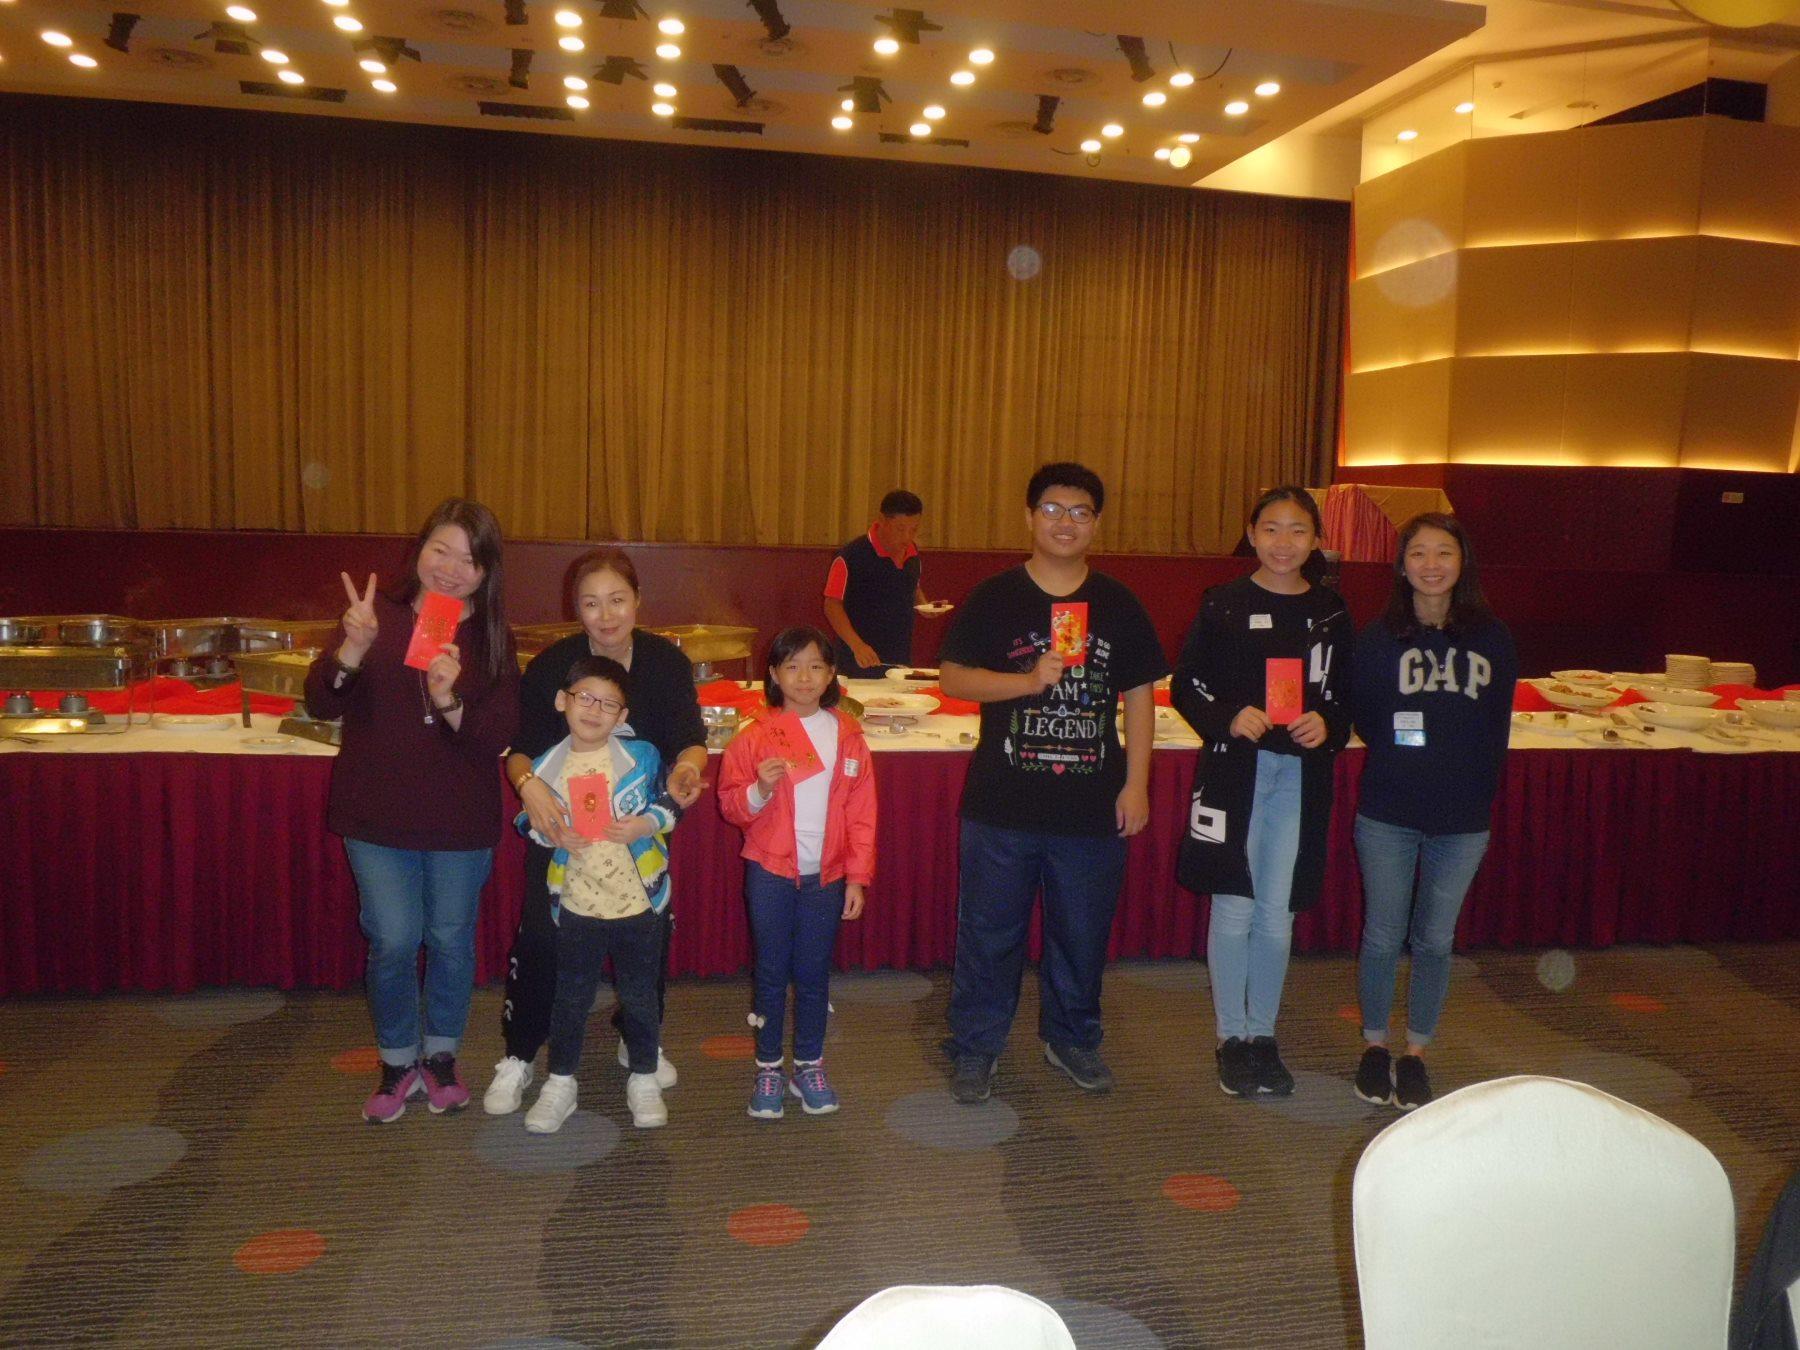 http://npc.edu.hk/sites/default/files/cimg3241.jpg